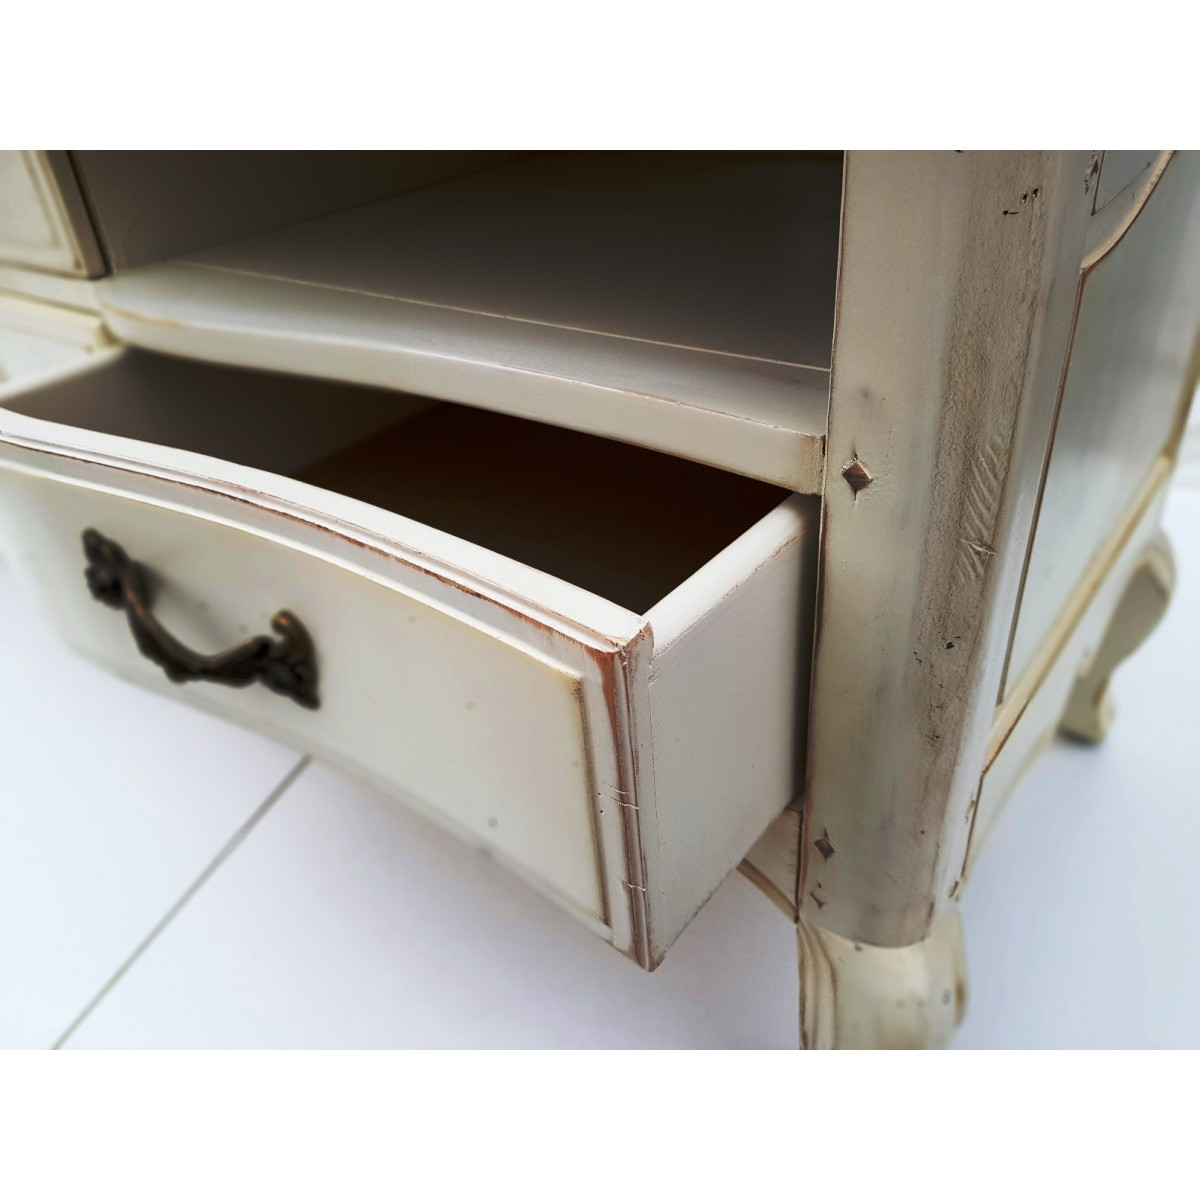 DF882 (S2) ТВ тумба коллекция Provence Noir&Blanc